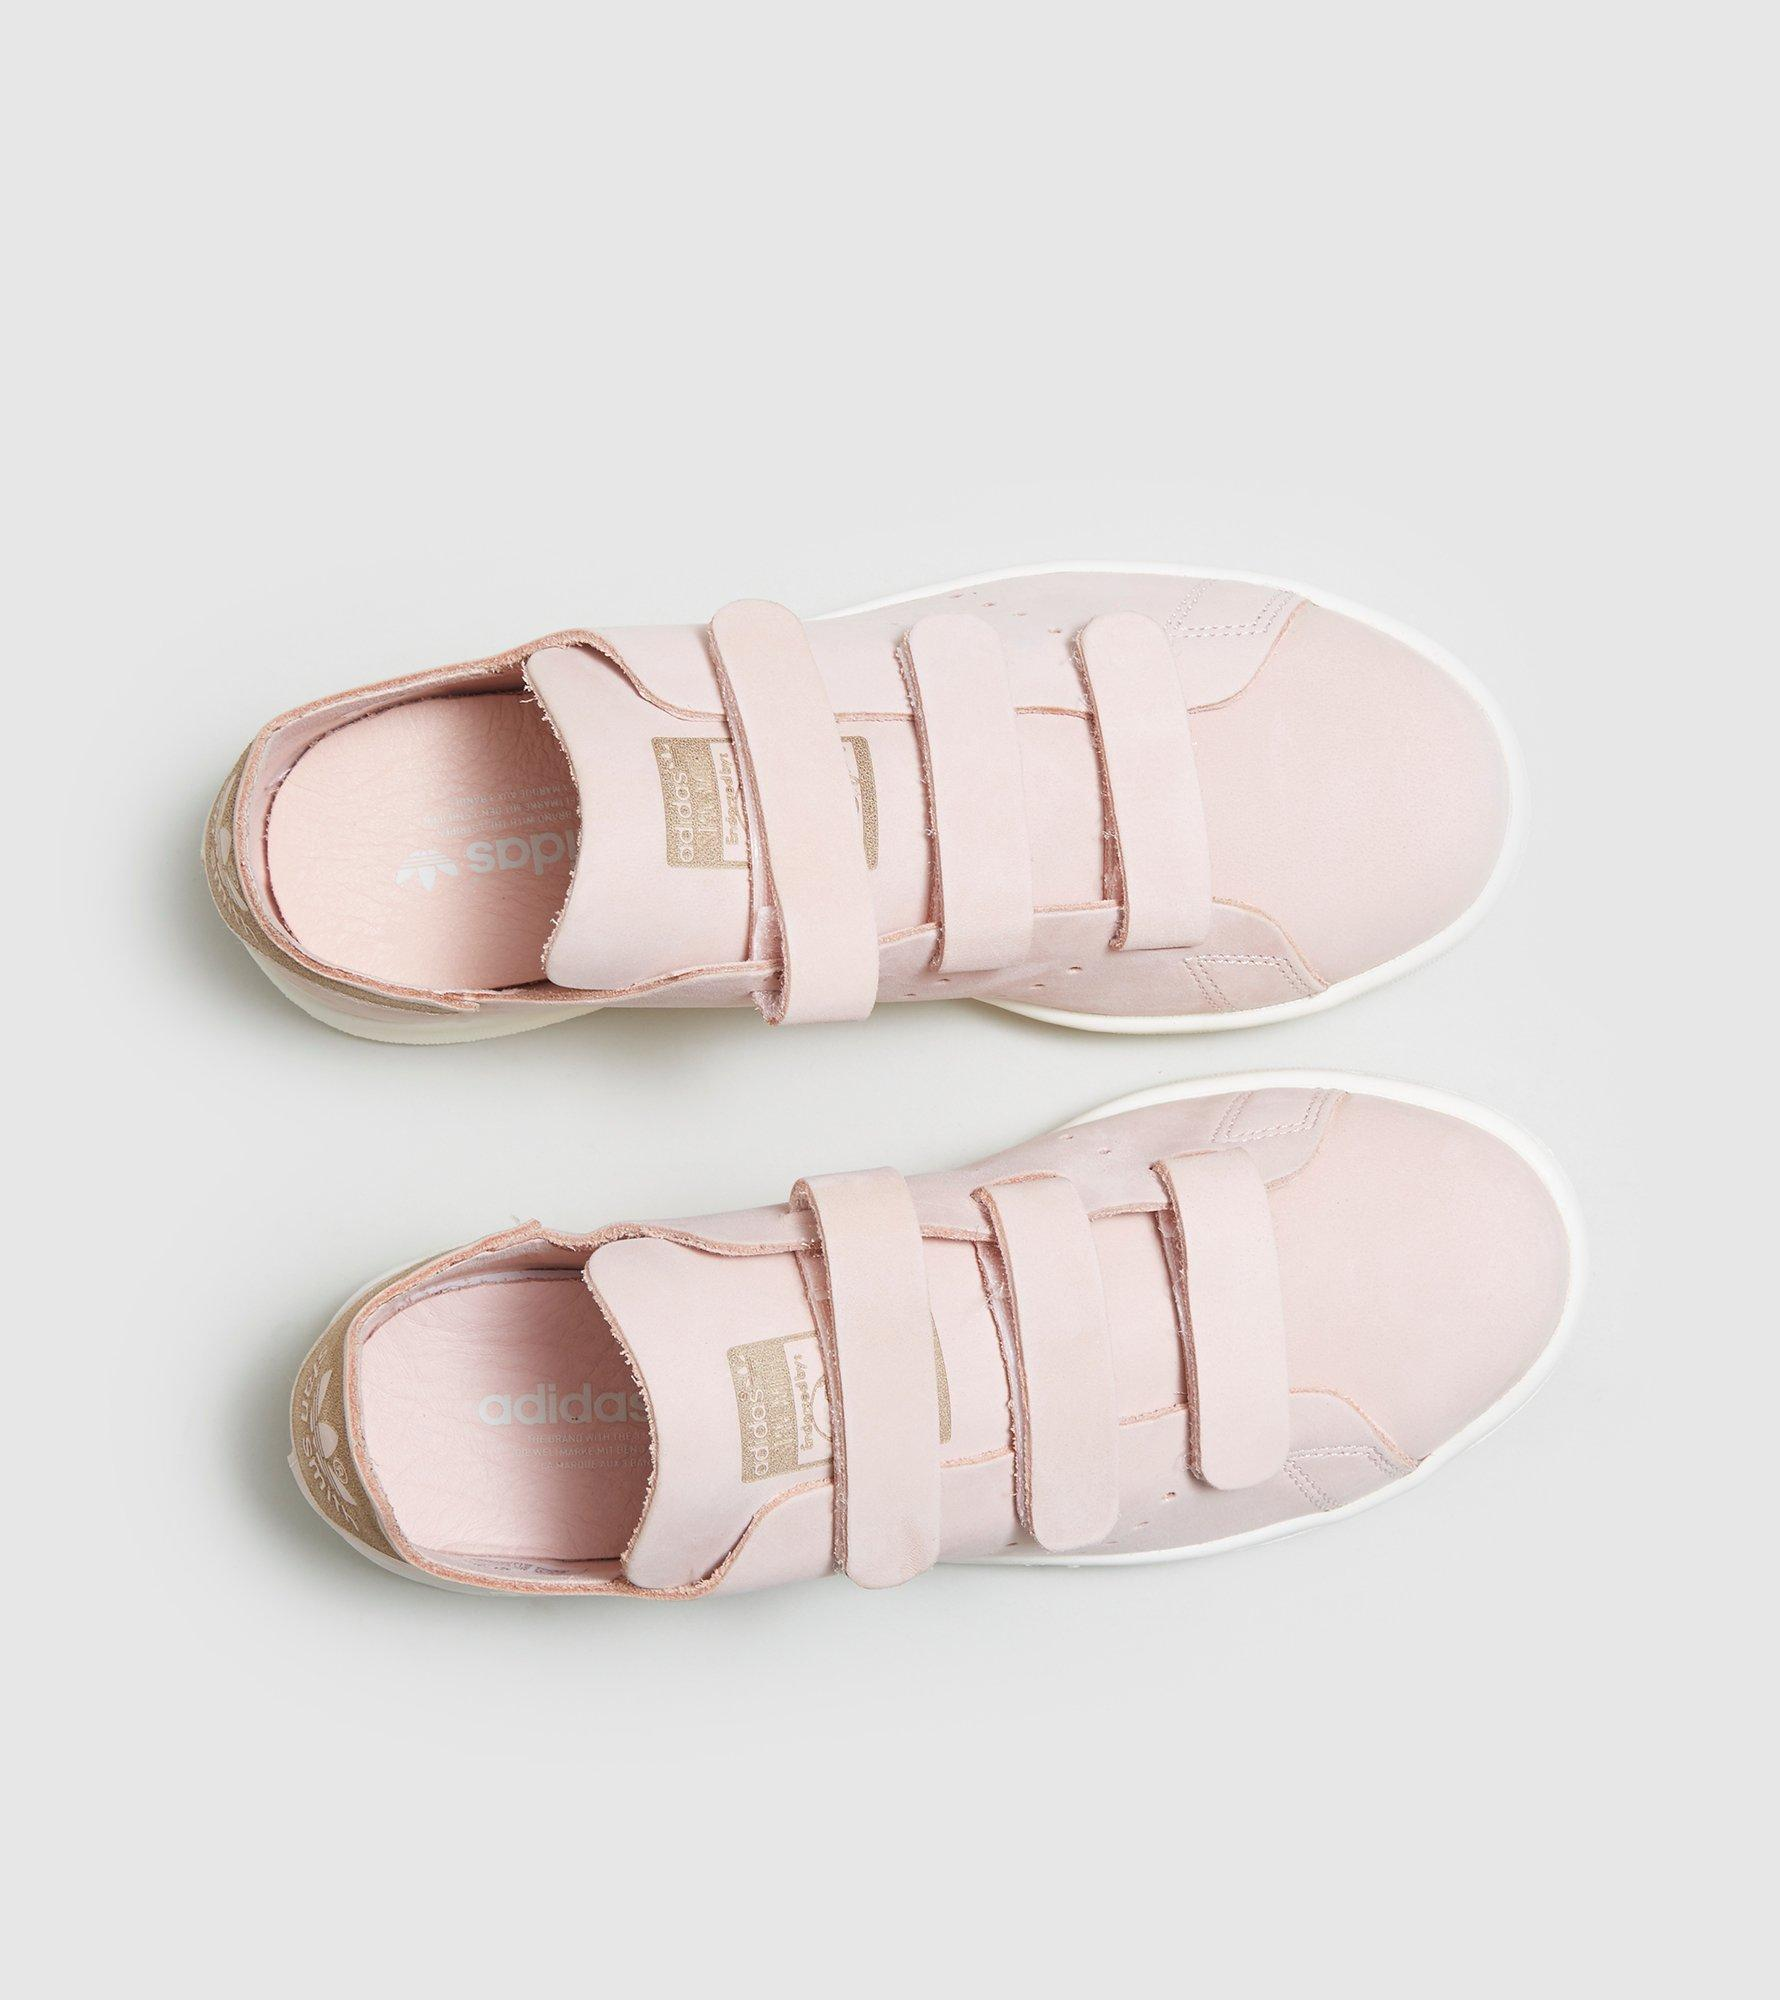 4e7d268cd969 adidas stan smith op cf vapour pink. Adidas Stan Smith OP CF Femme (Rose)  ...